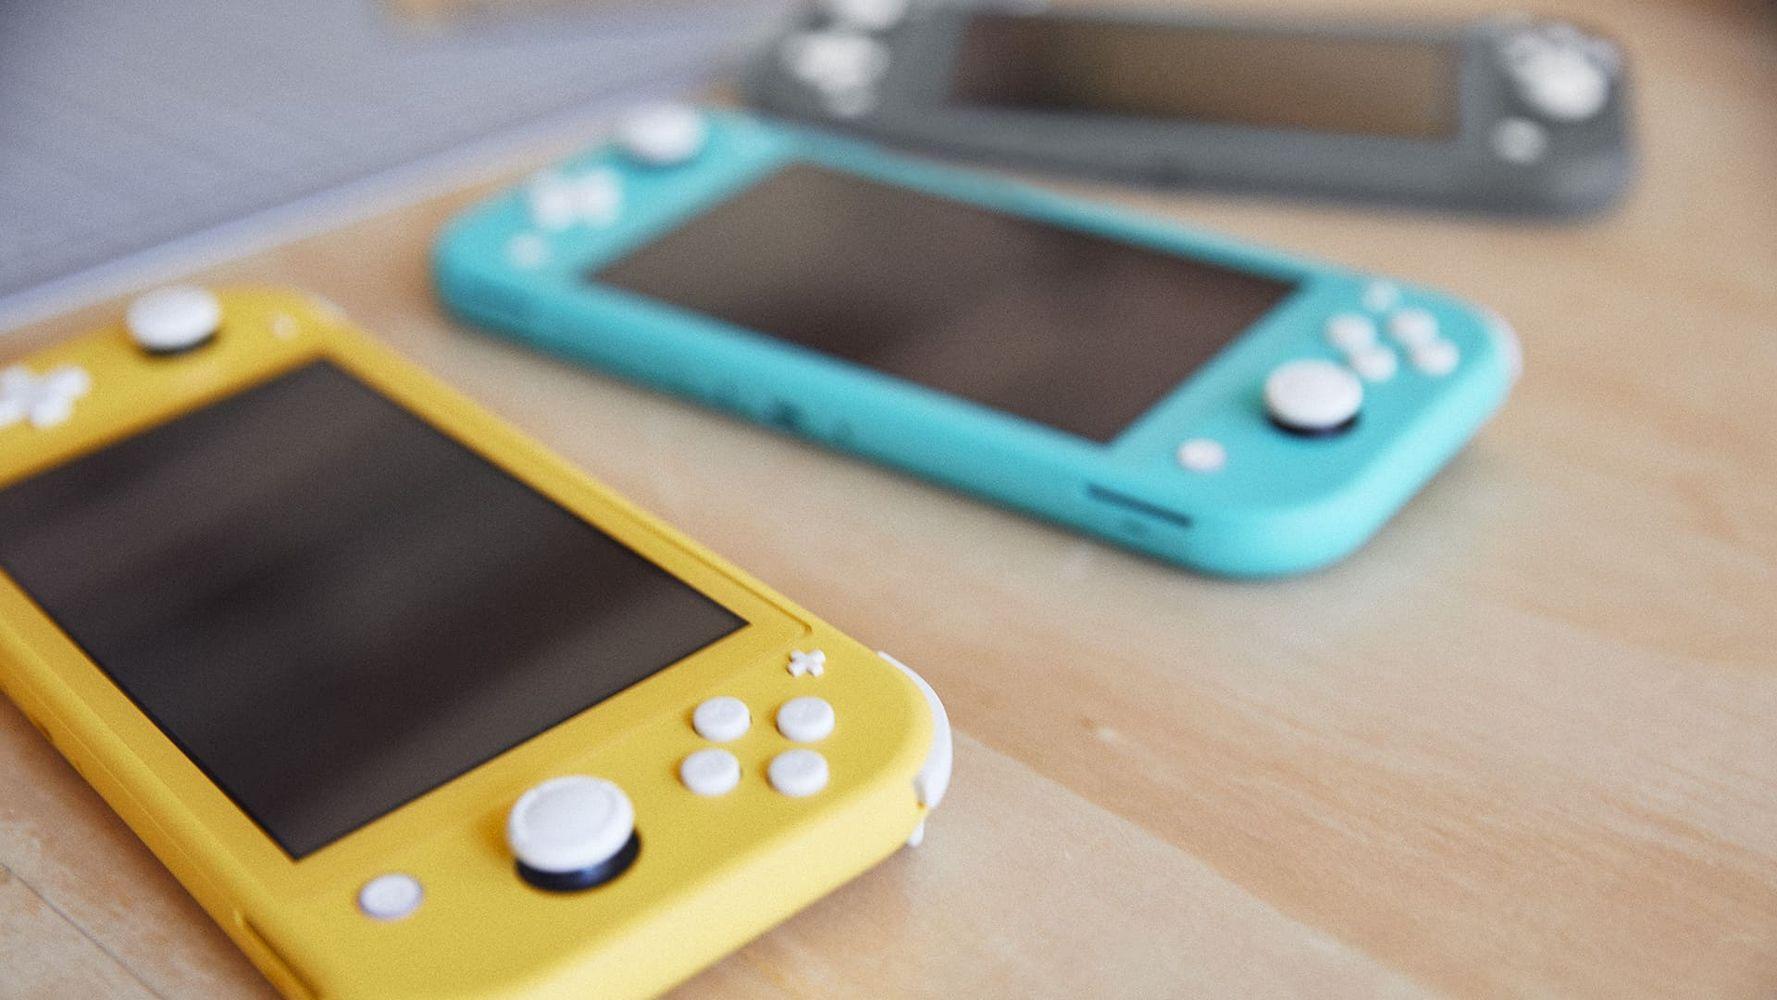 Nintendo Switch o Switch Lite: quale scegliere?